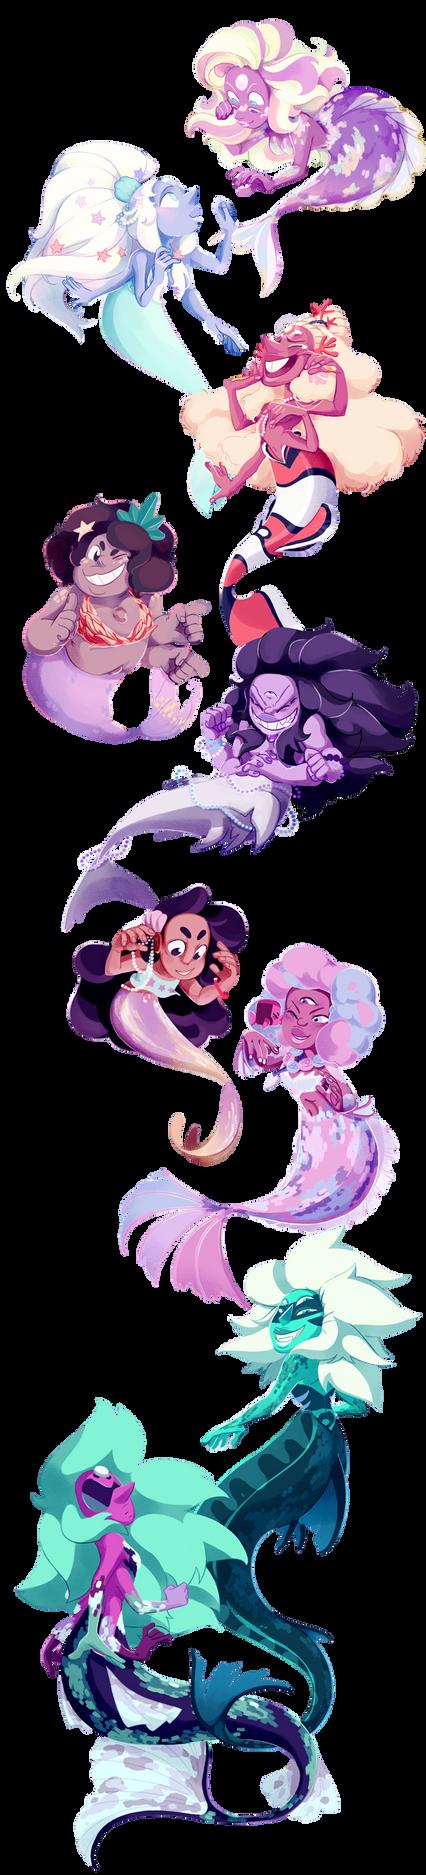 It's the Fusion Mermaid brigade! by weirdlyprecious